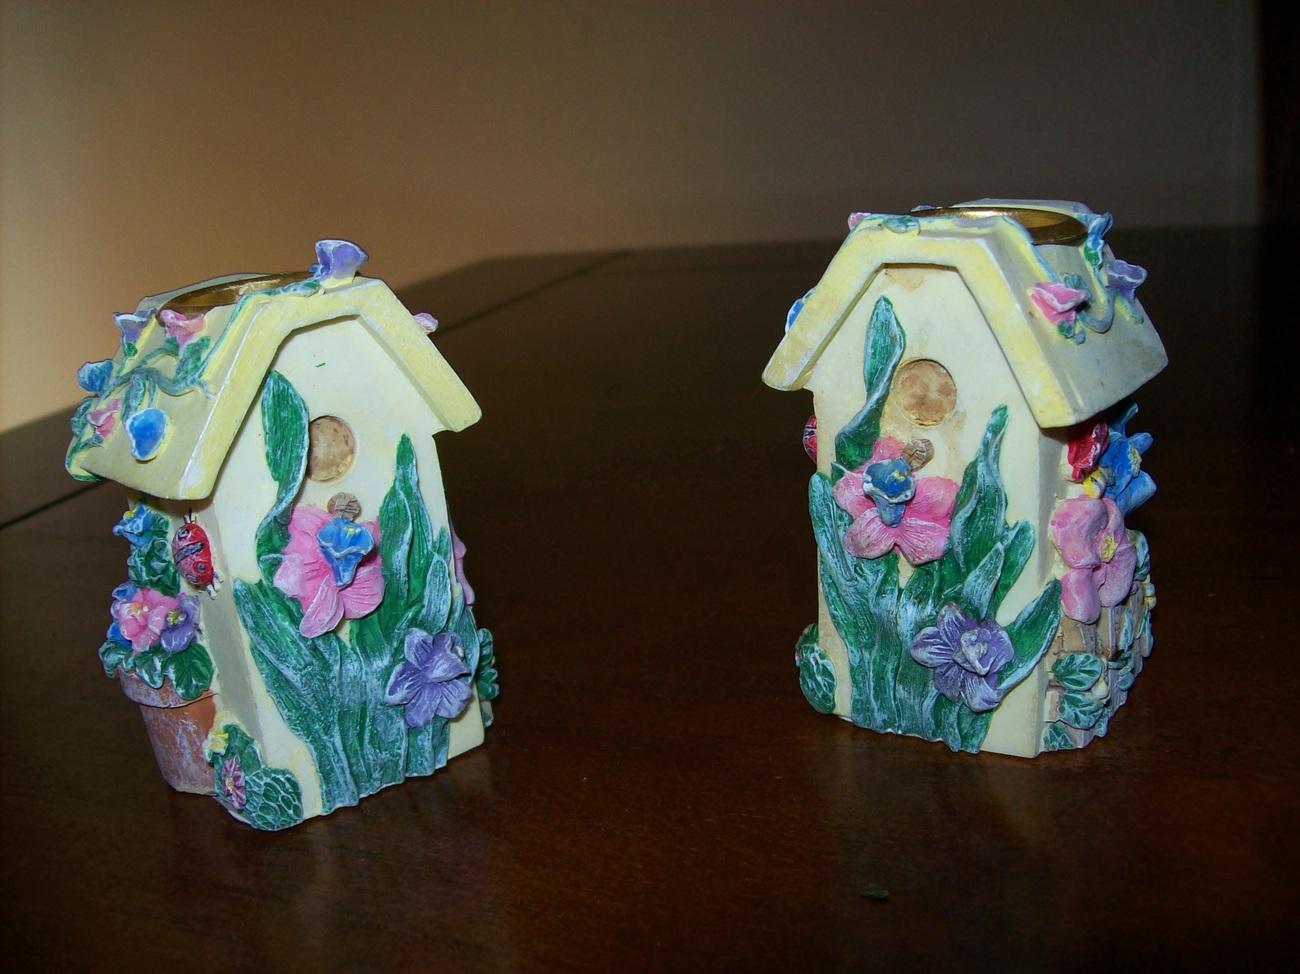 set of 2 birdhouse springtime candlestick holders